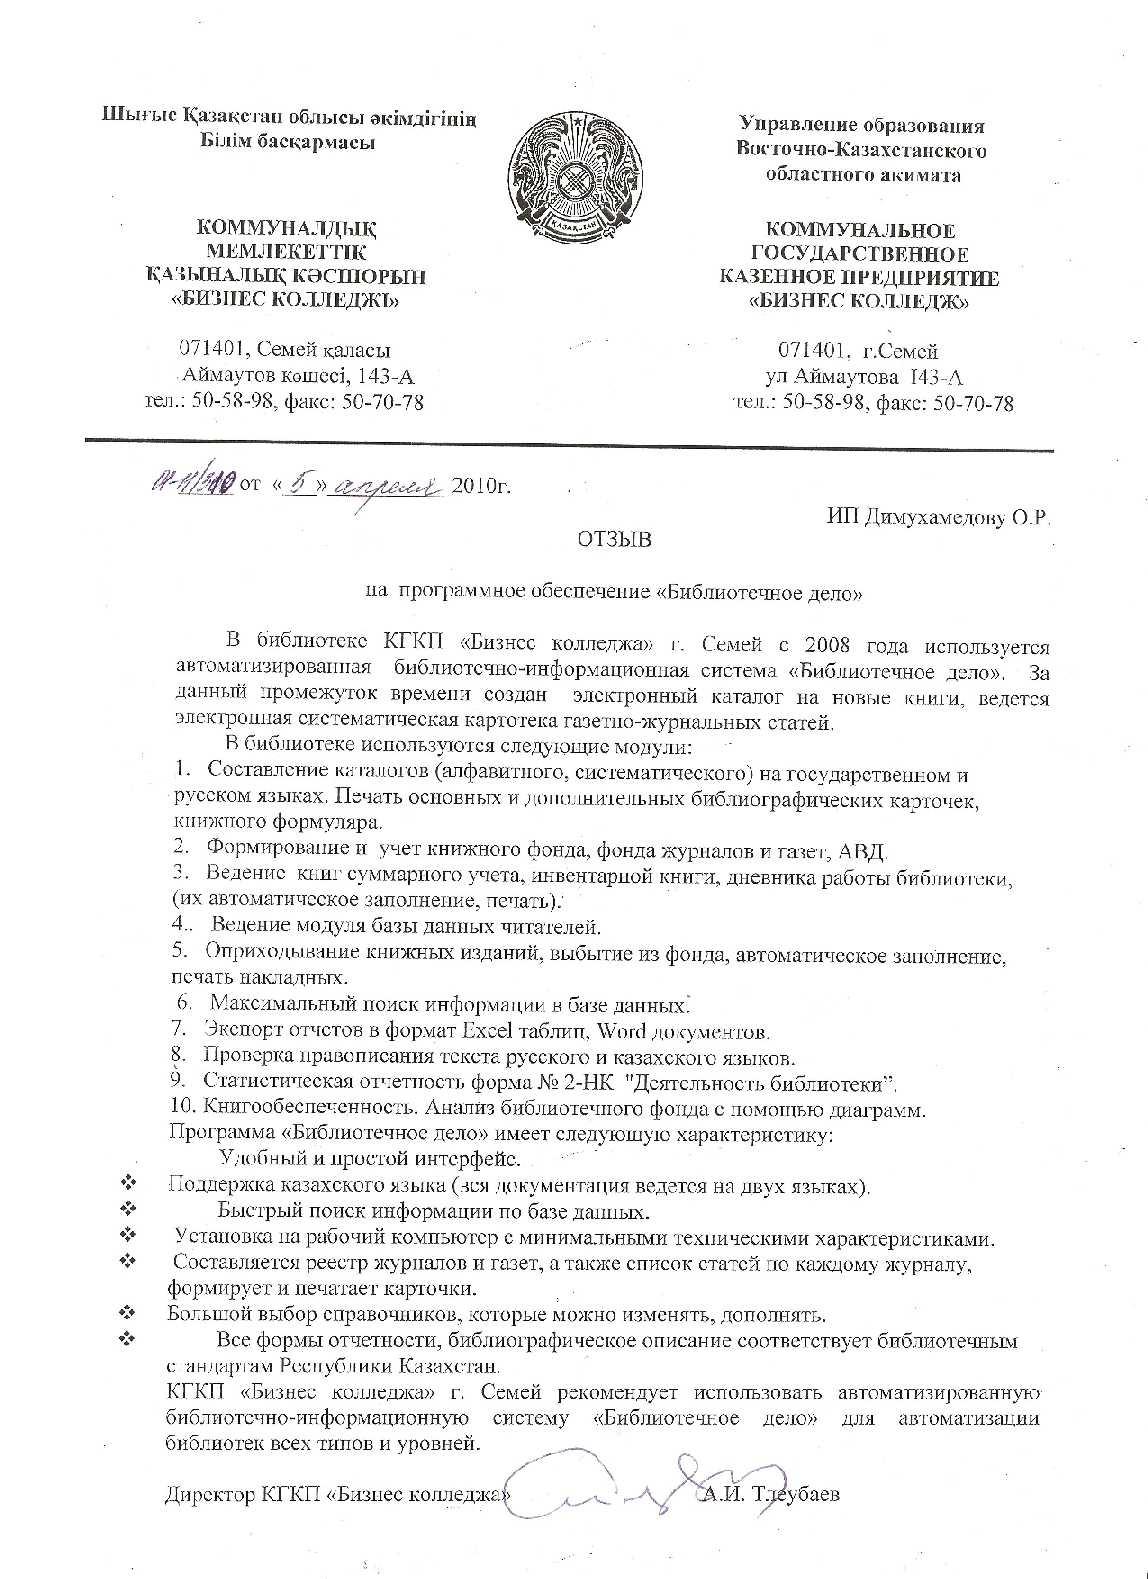 "Отзыв АБИС КГКП ""Бизнес колледж"" г. Семей"